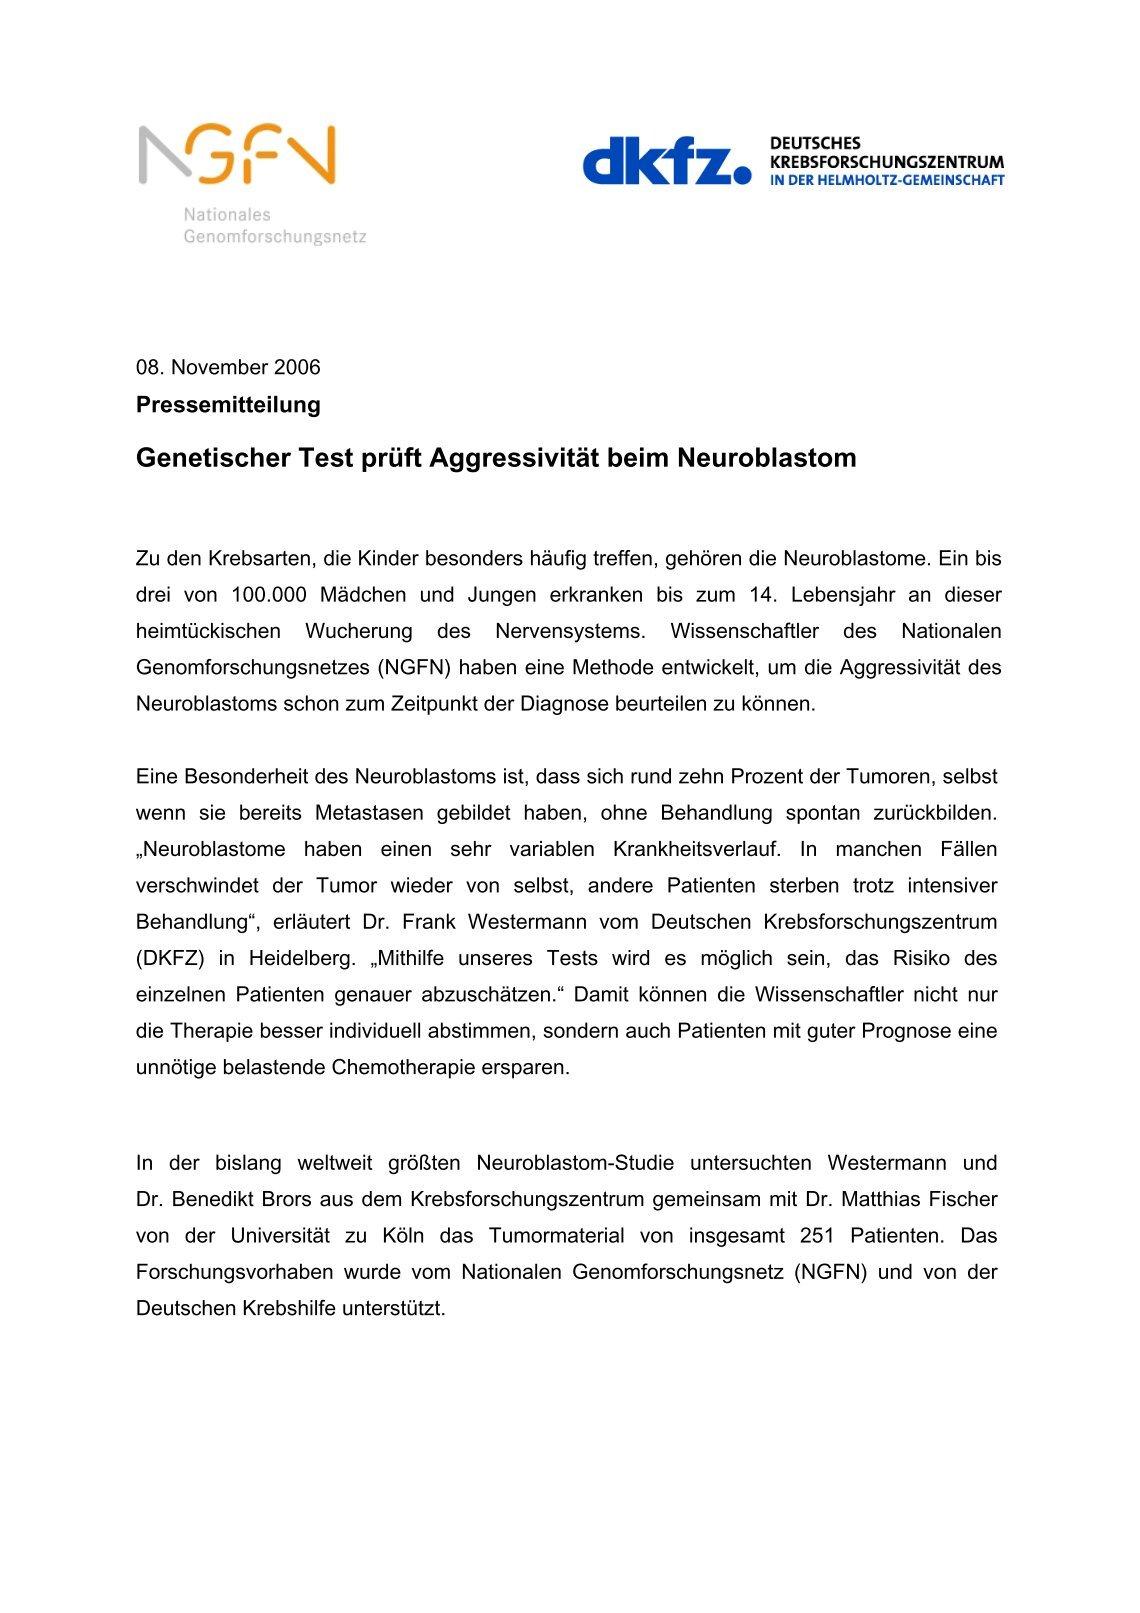 30 free Magazines from NGFN.2.NGFN.DE